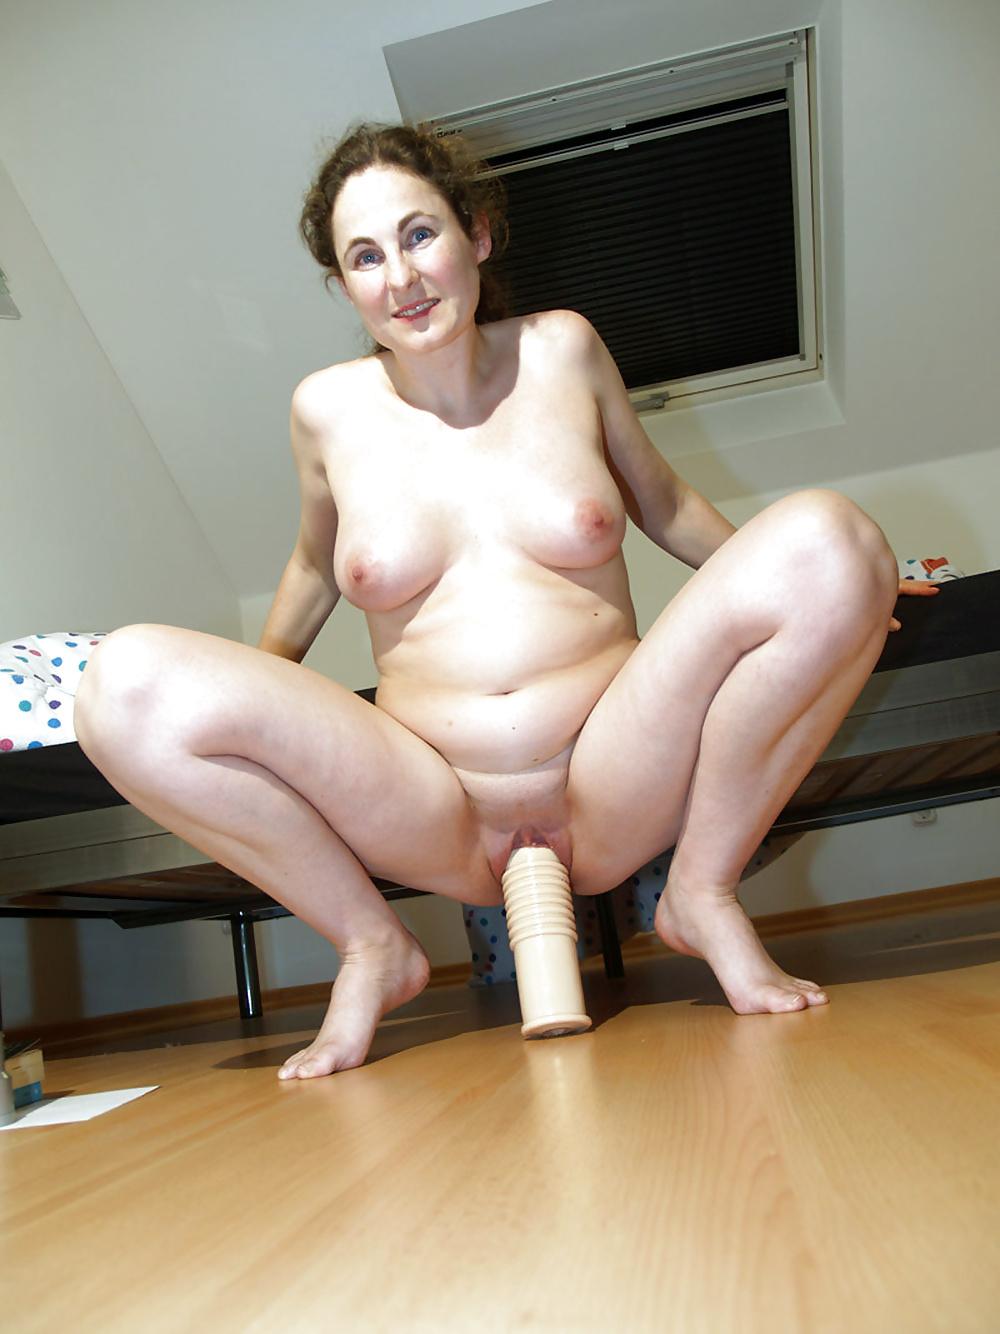 free-amateur-dildo-pics-wwe-nude-stacey-kiebler